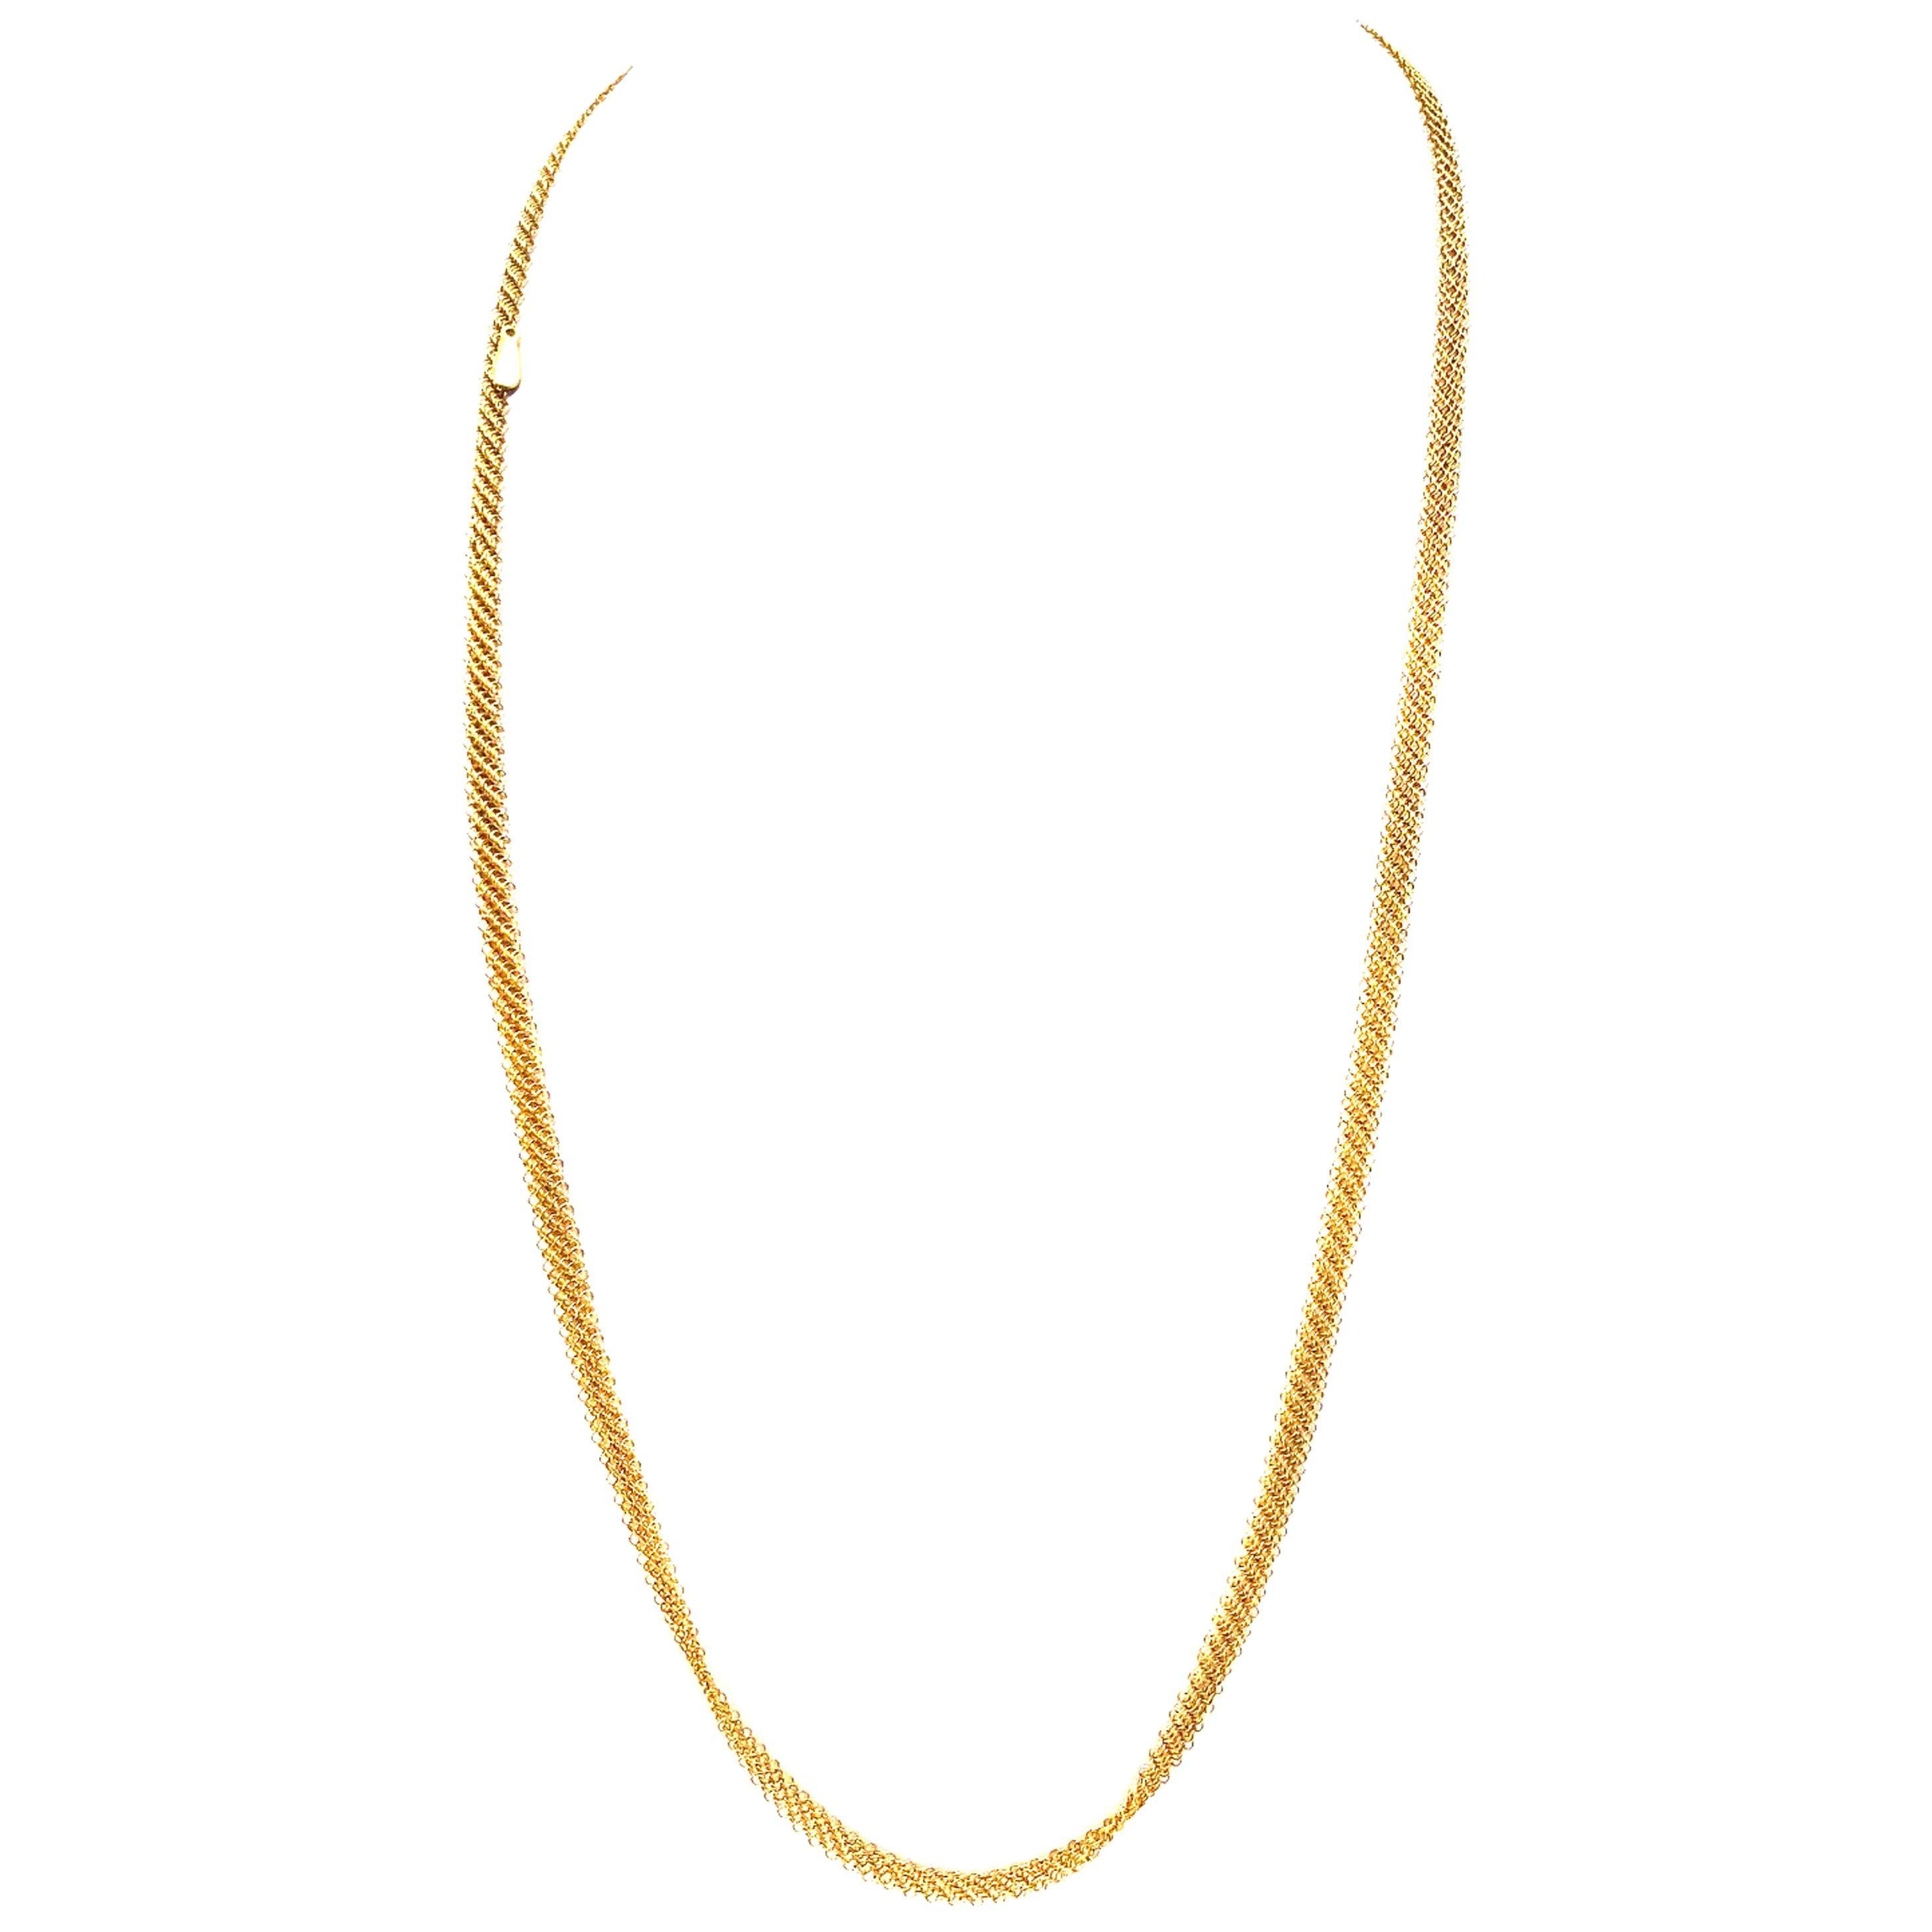 Elsa Peretti for Tiffany & Co. 18 Karat Long Mesh Necklace